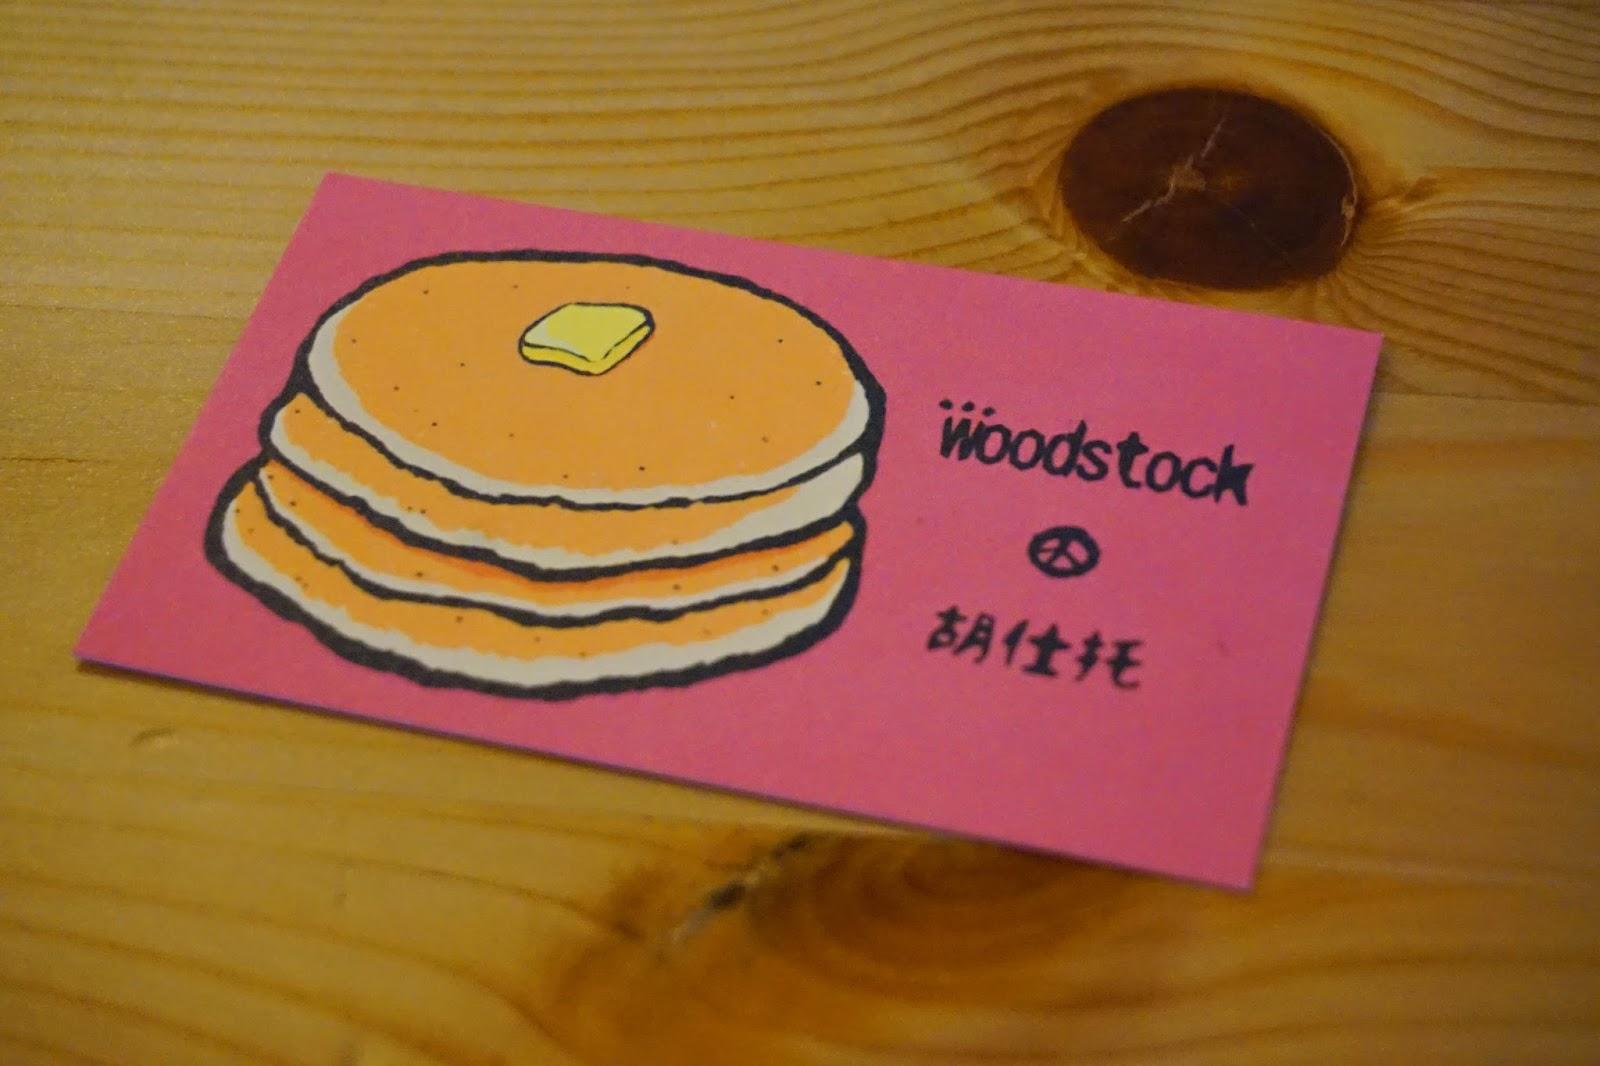 11-hualien-travel-woodstock-pancake-IMG_3632-beautyanxiety.com-hualien-desserts-woodstock-pancake